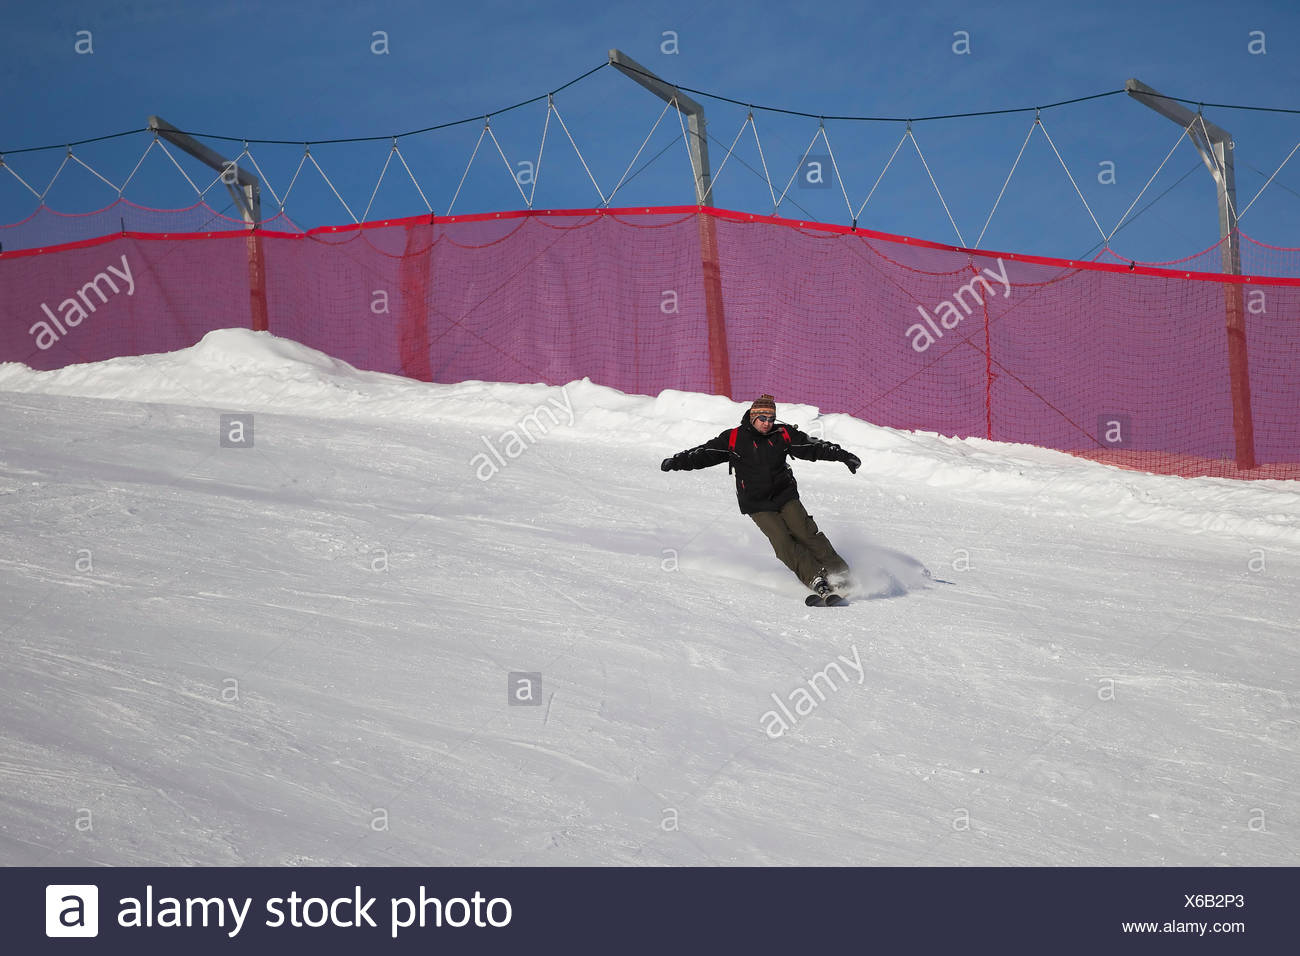 downhill - Stock Image